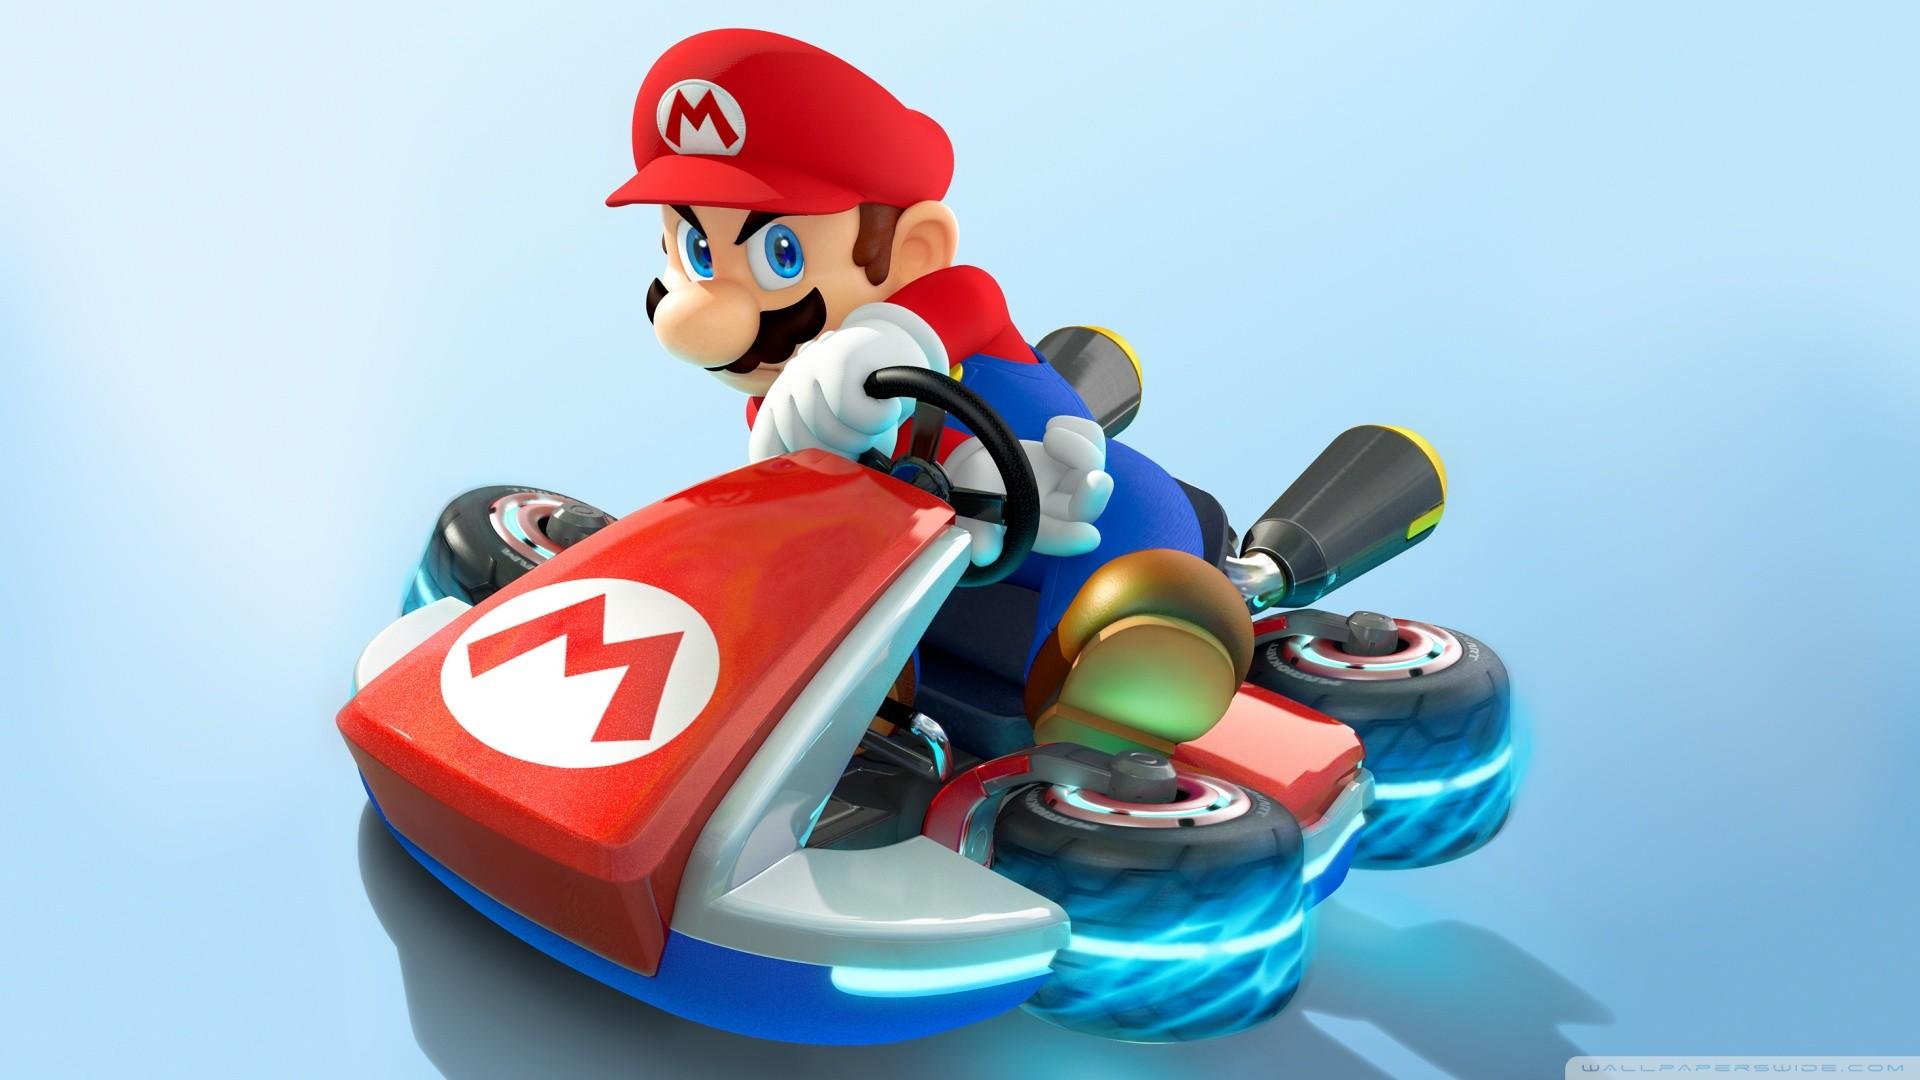 Mario Kart Wallpaper Wallpapertag